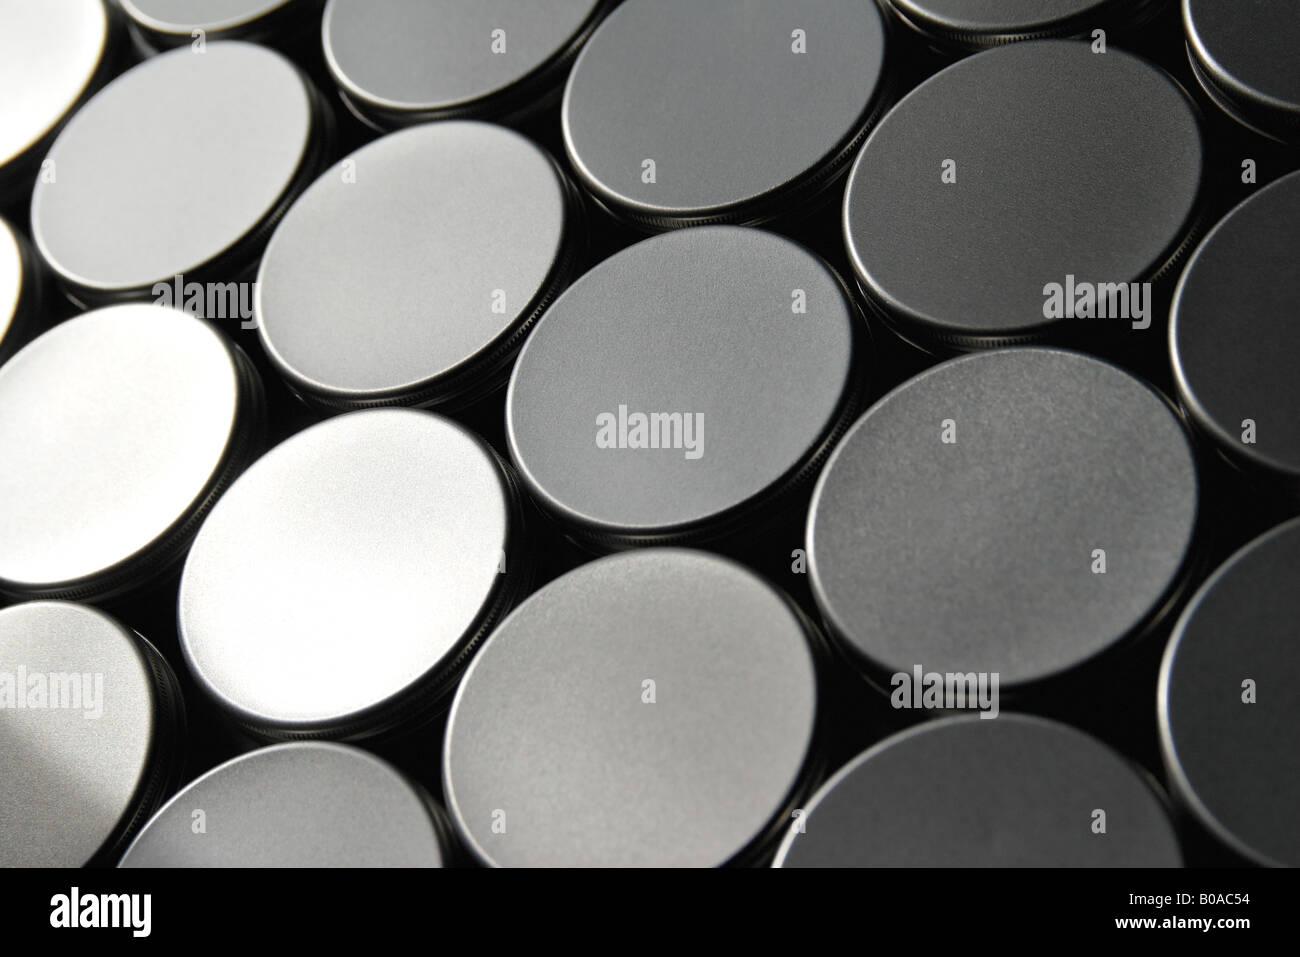 Couvercles disposés en motif, close-up, full frame Photo Stock